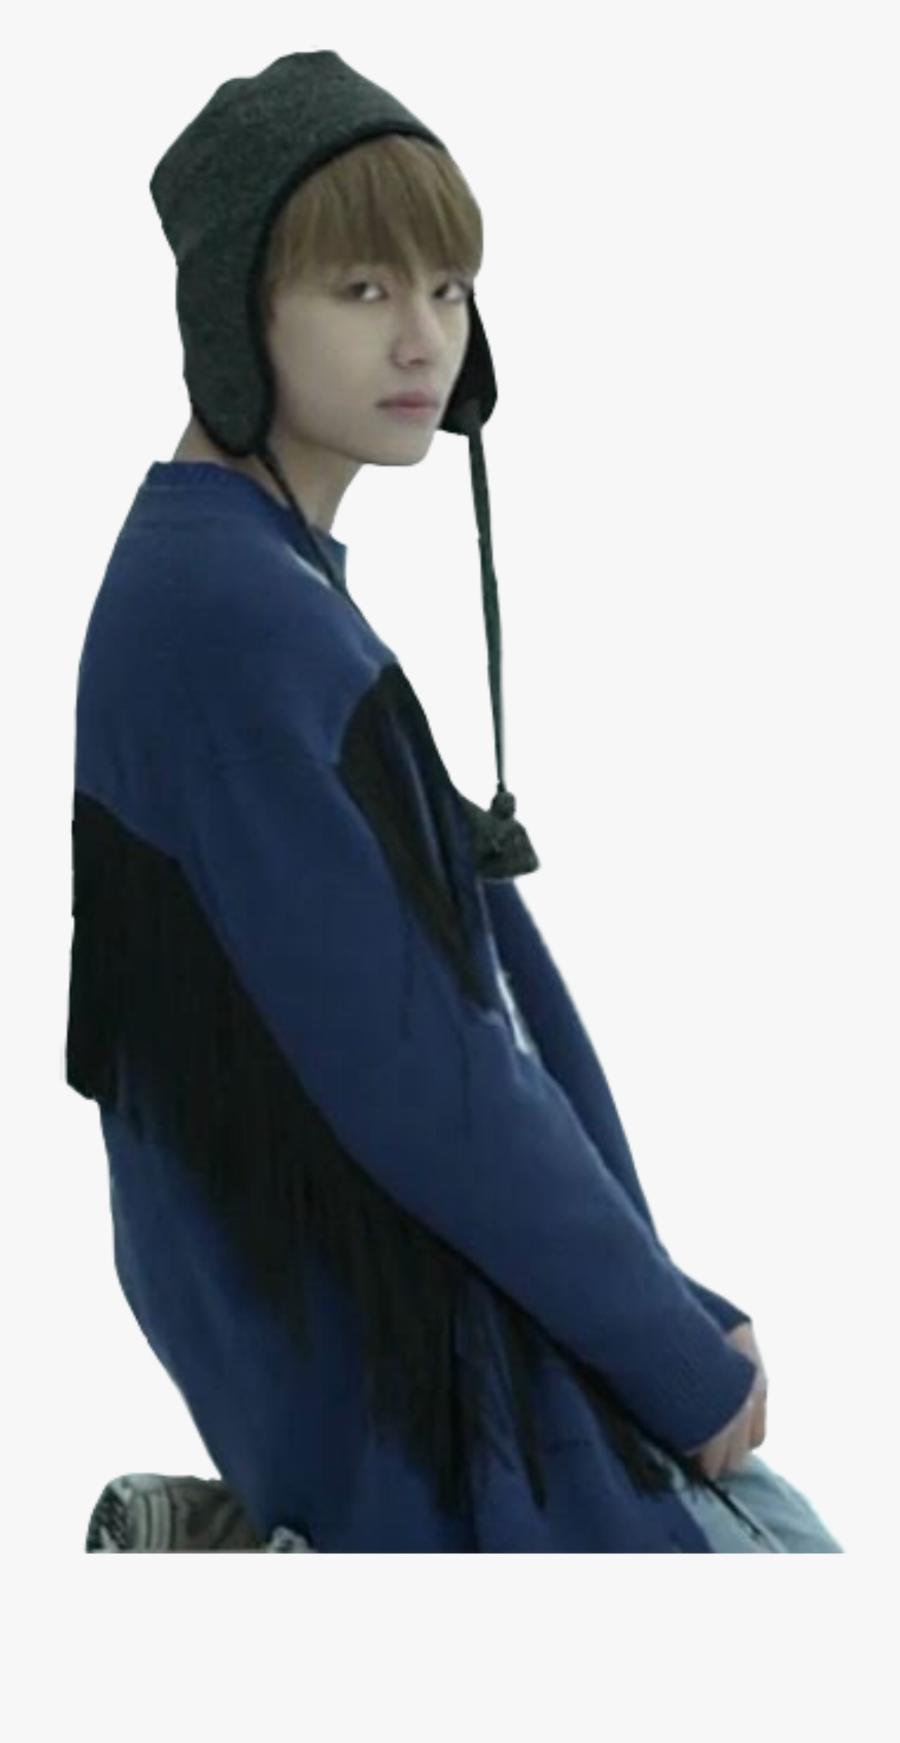 Spring Day Tae Sicker - Bts, Transparent Clipart